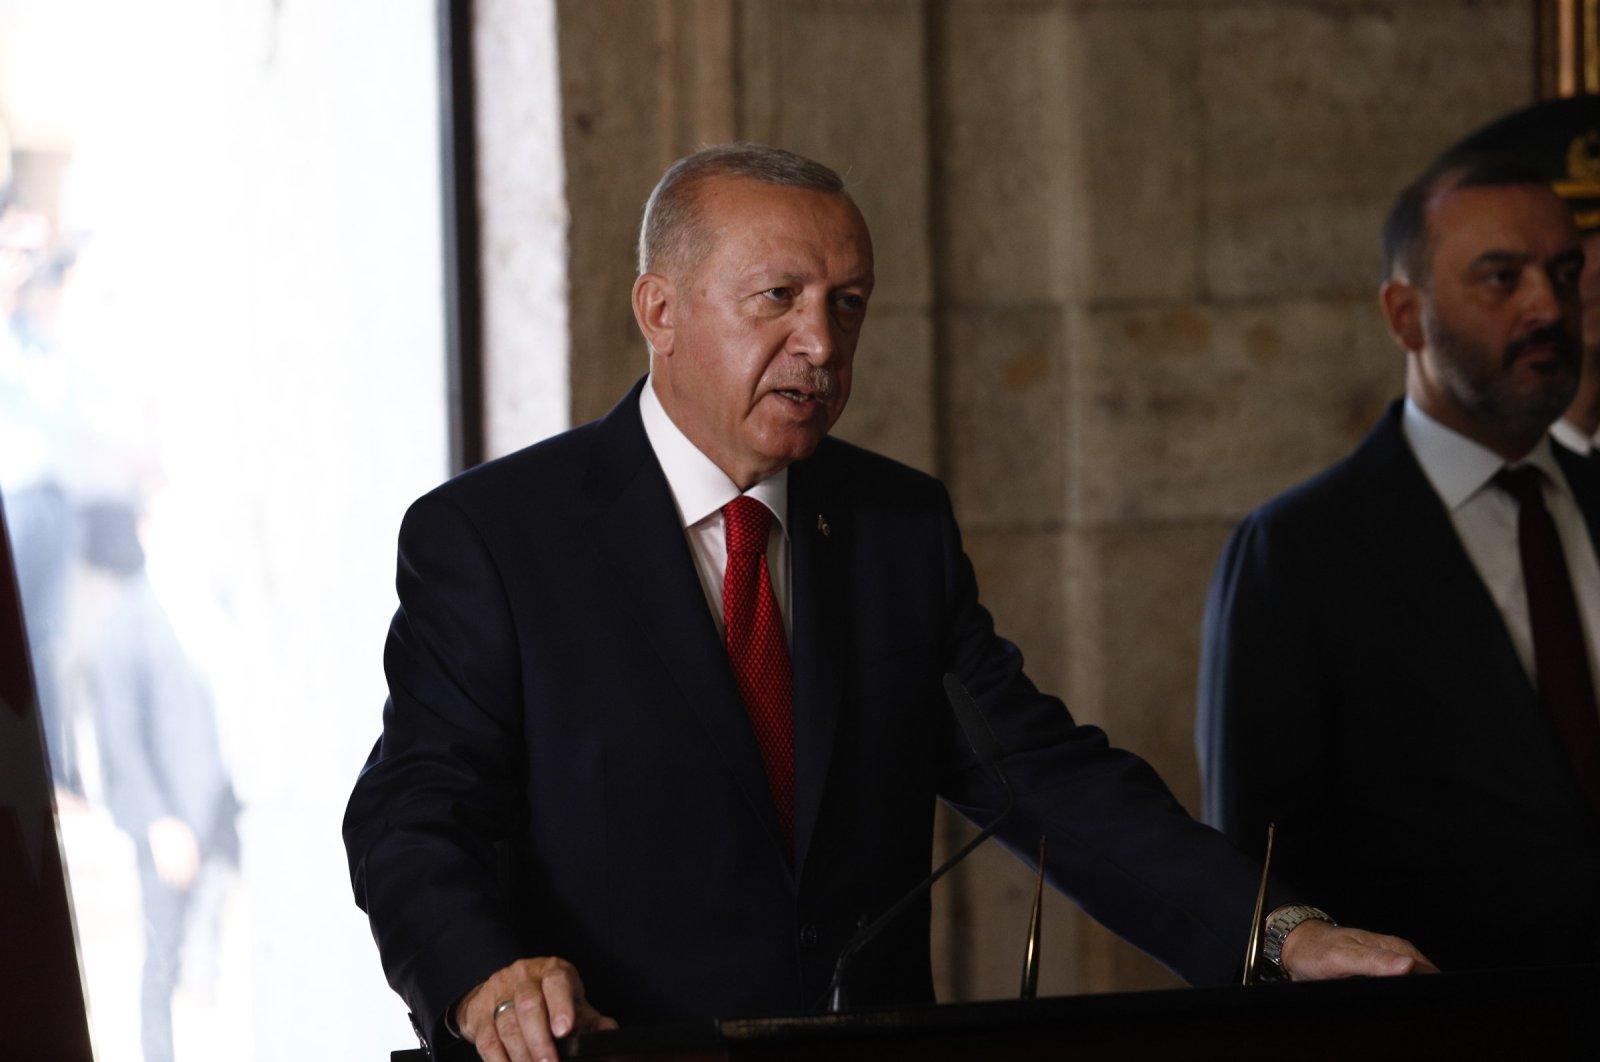 President Recep Tayyip Erdoğan, speaking at Anıtkabir, Sept. 11, 2019. (DHA Photo)